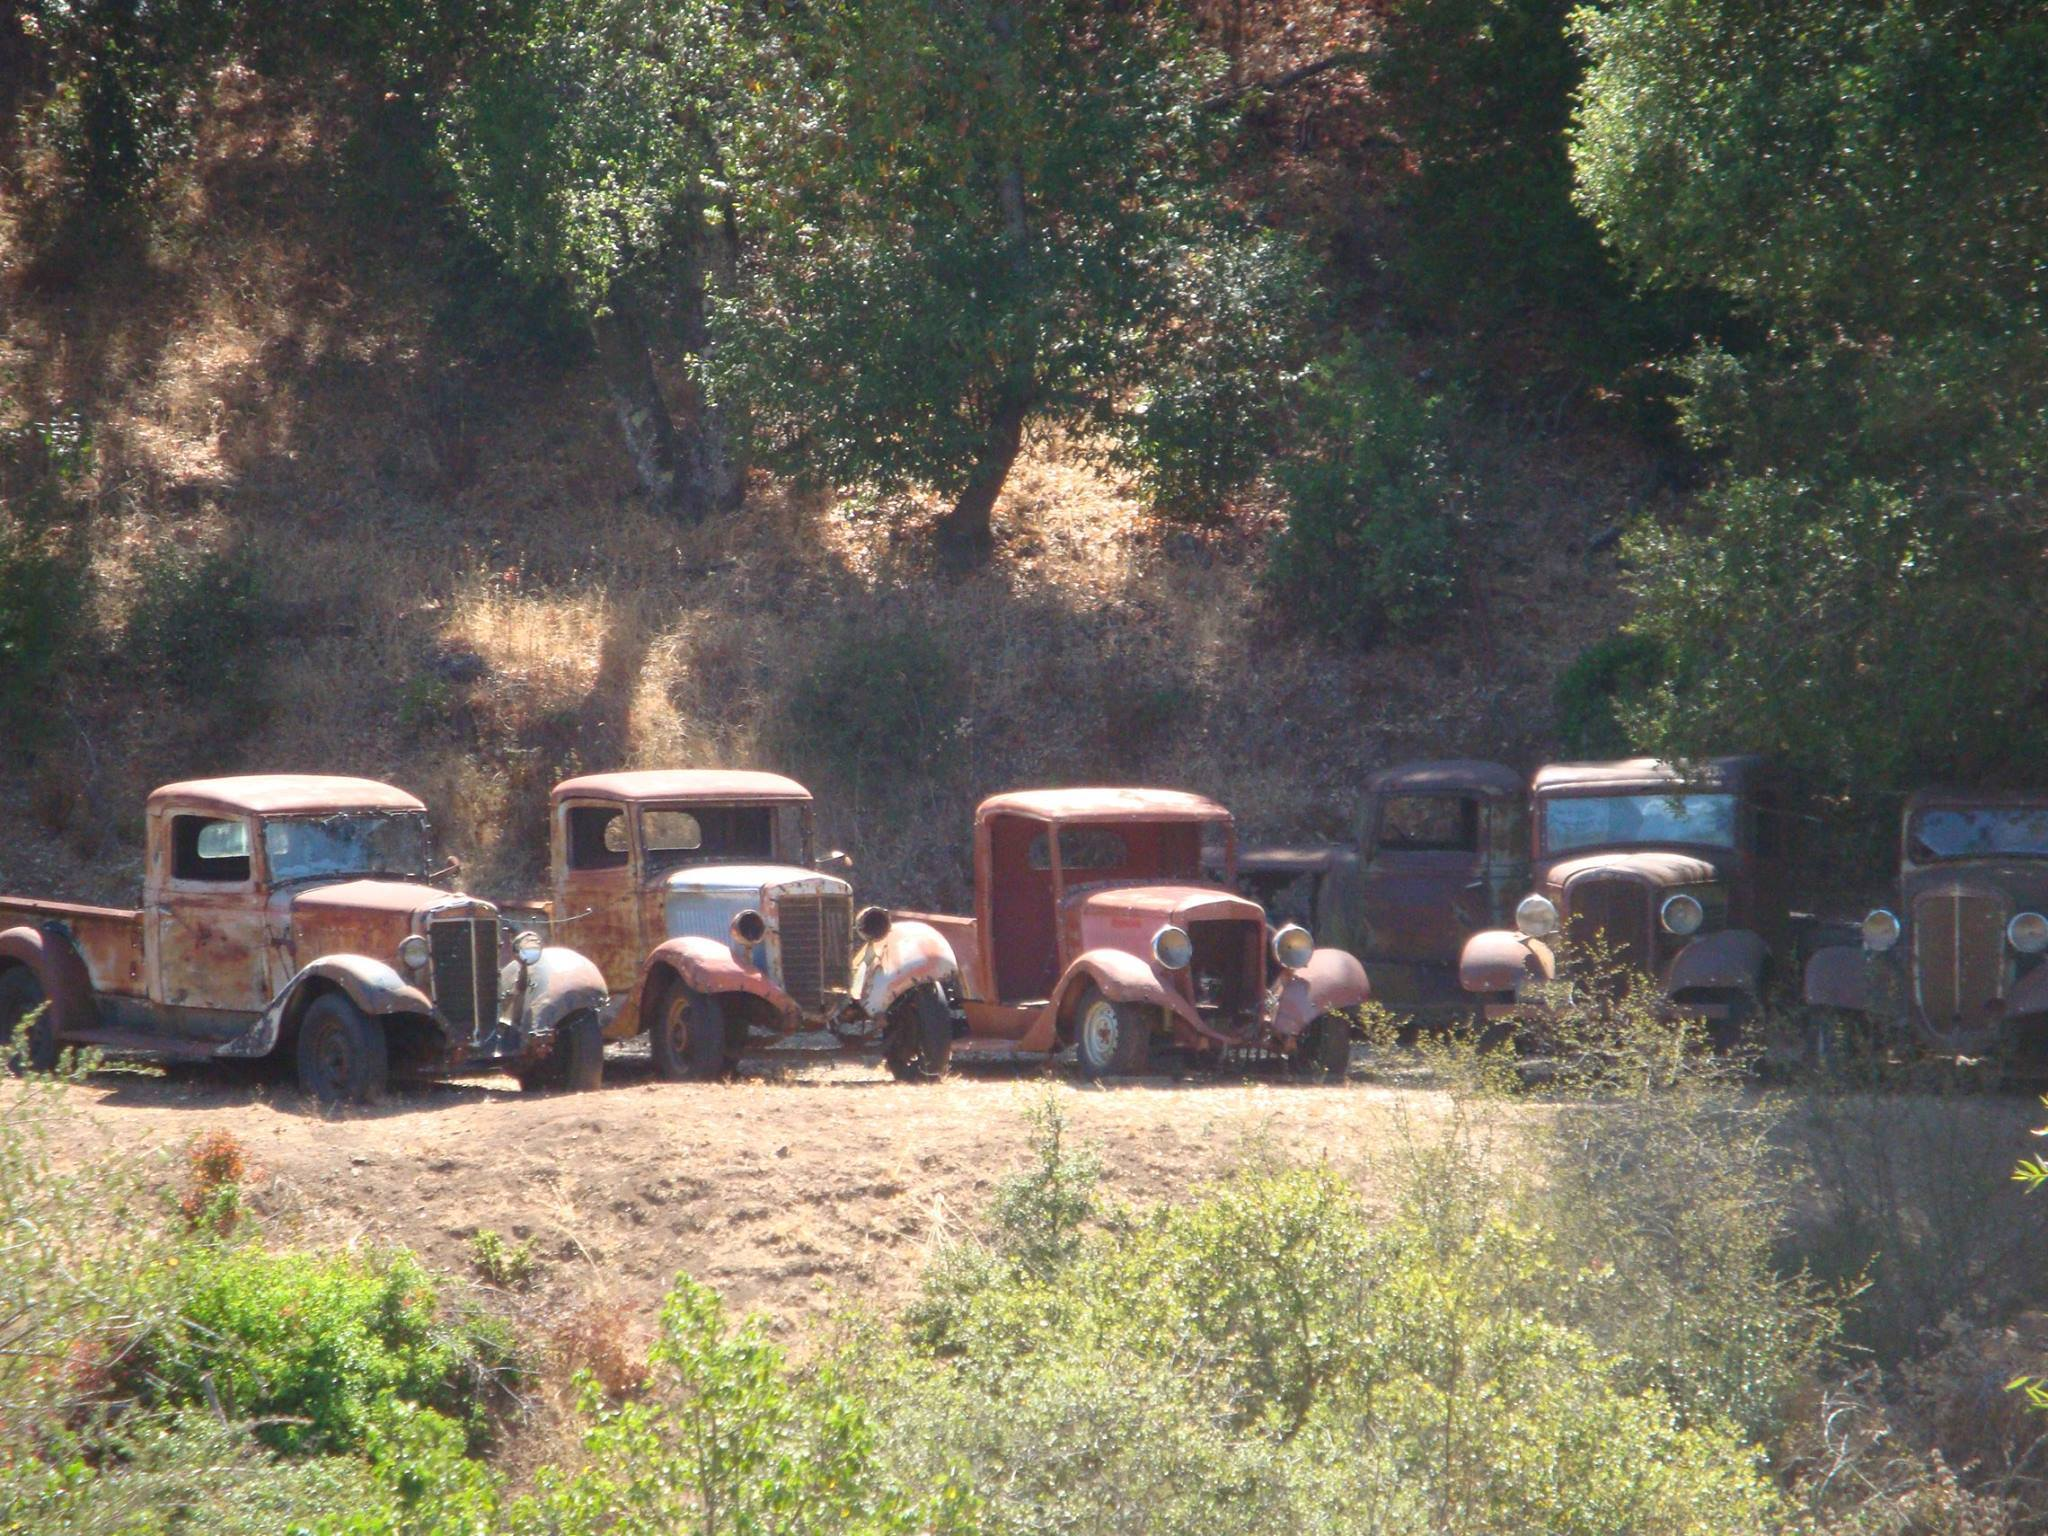 2-X-Chevy-1936-Chevy-1932-2-X-Chevi-1936